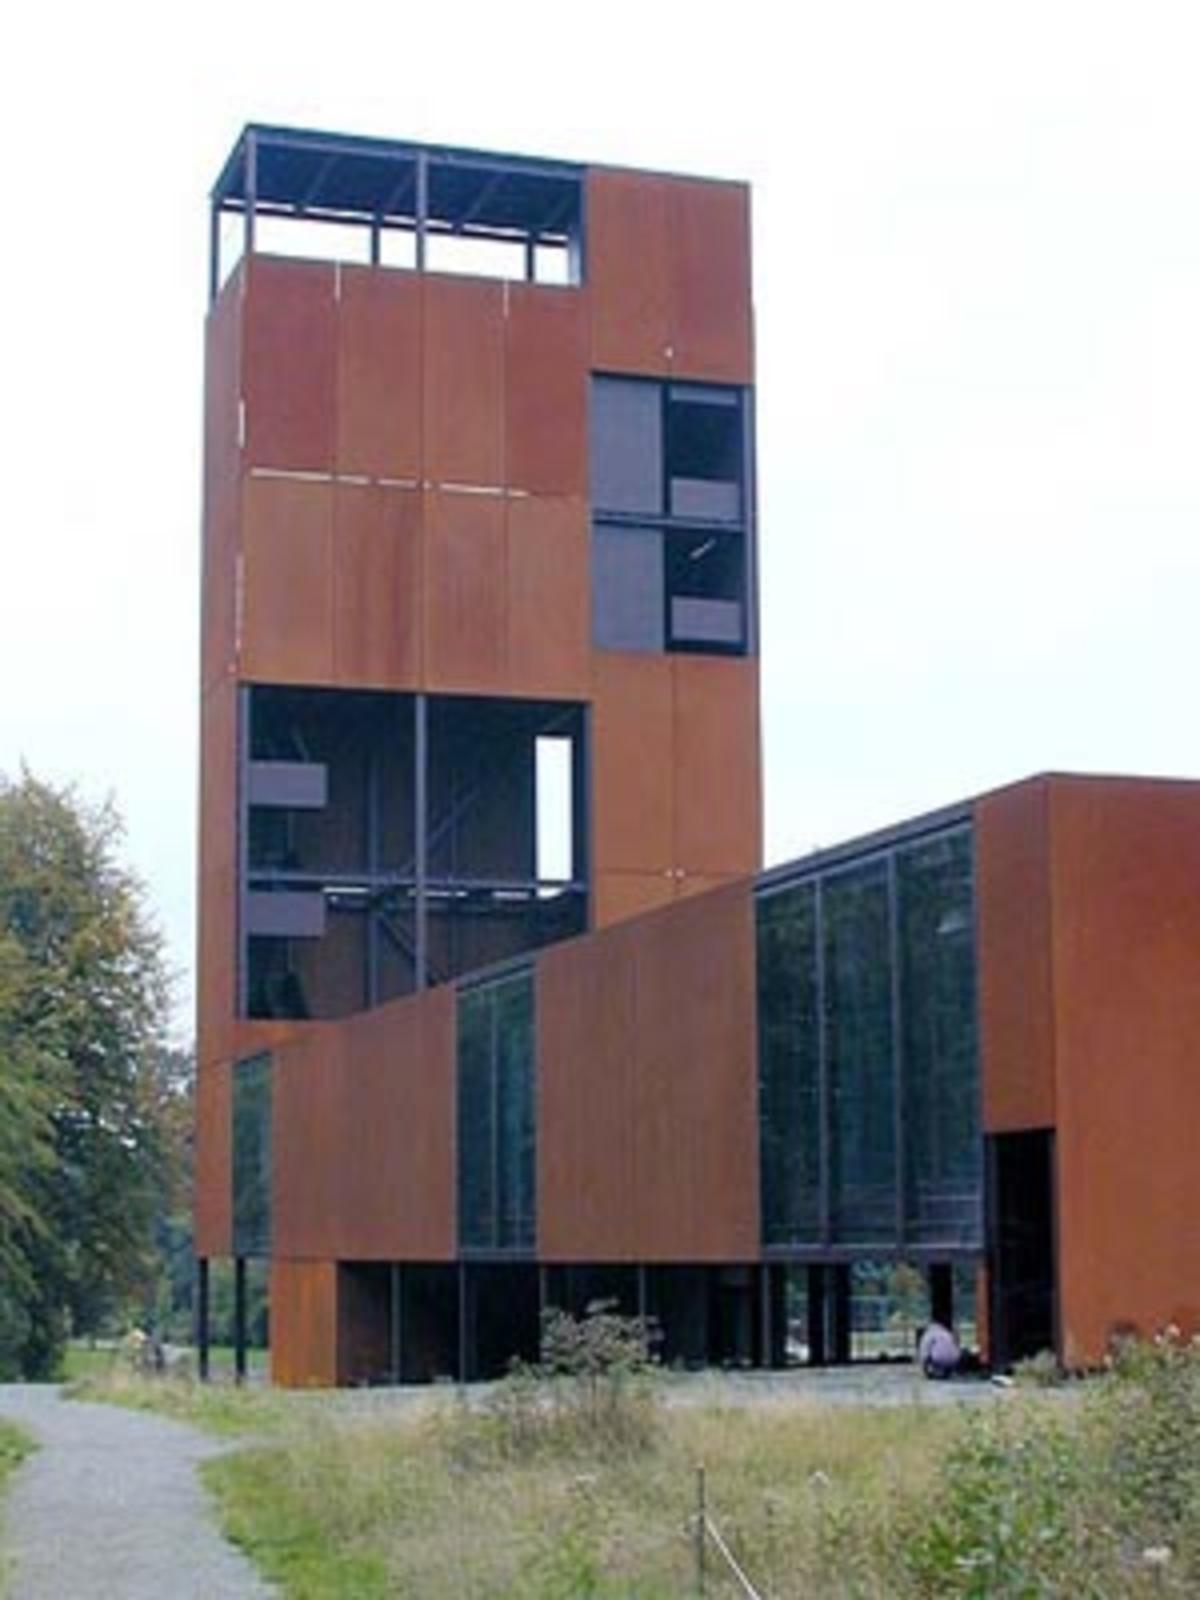 Gigon Guyer Kalkriese Museum And Park Under Construction